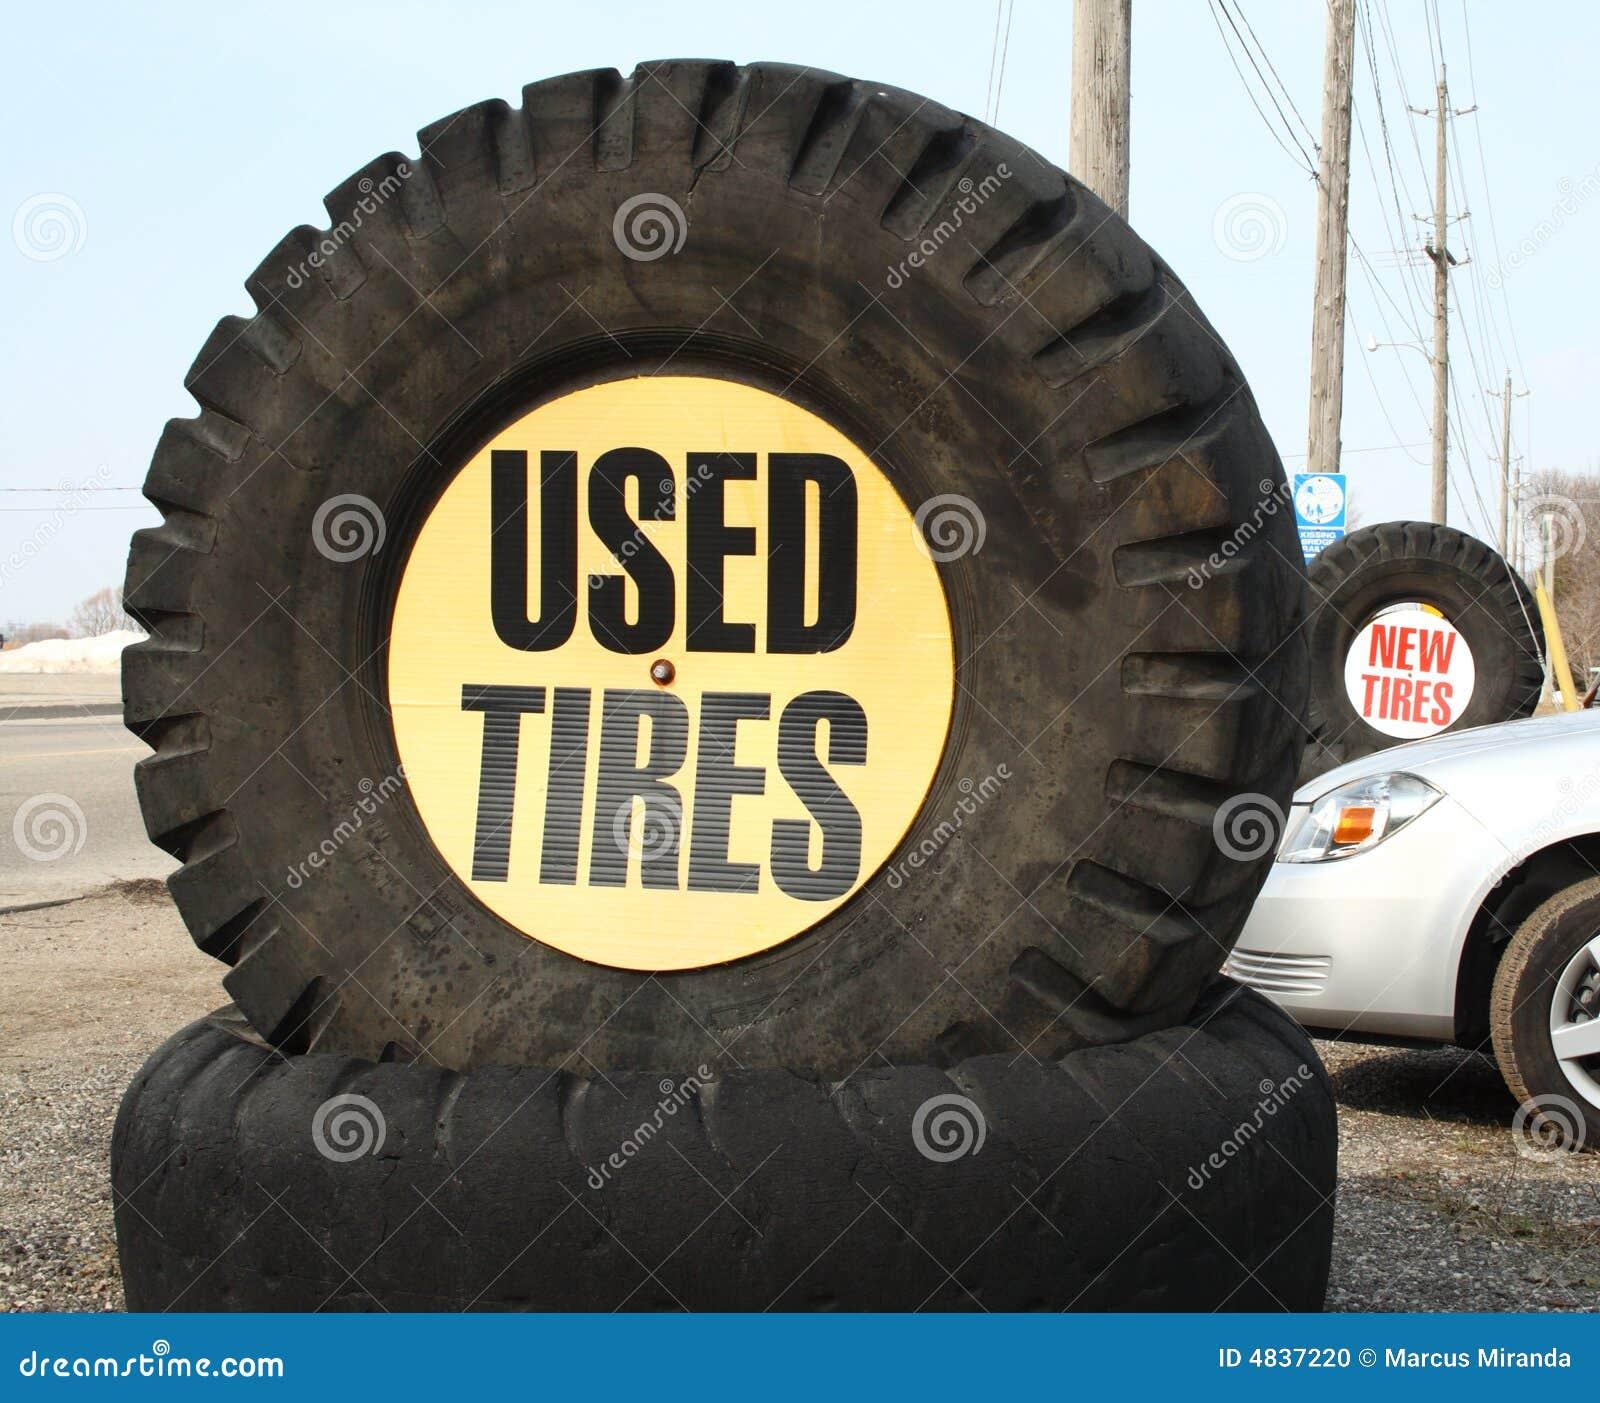 A Sample Tire Shop Business Plan Template